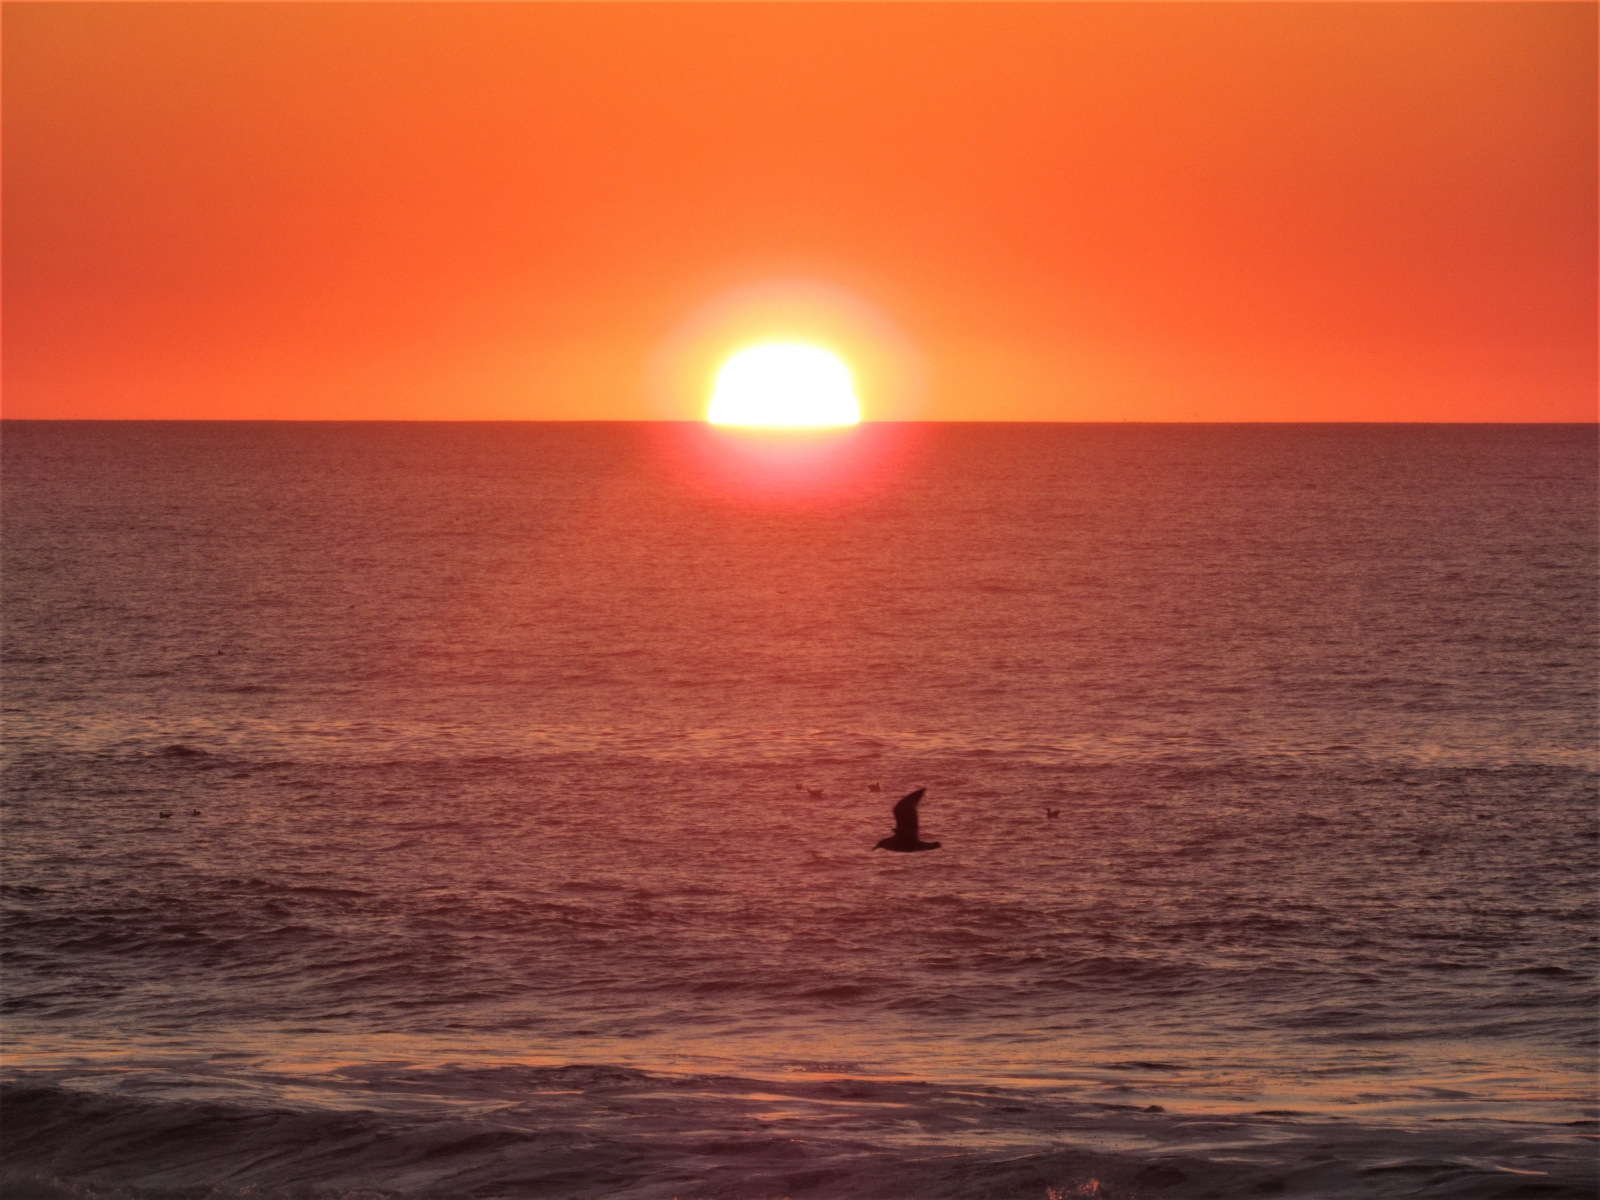 sea-and-gull